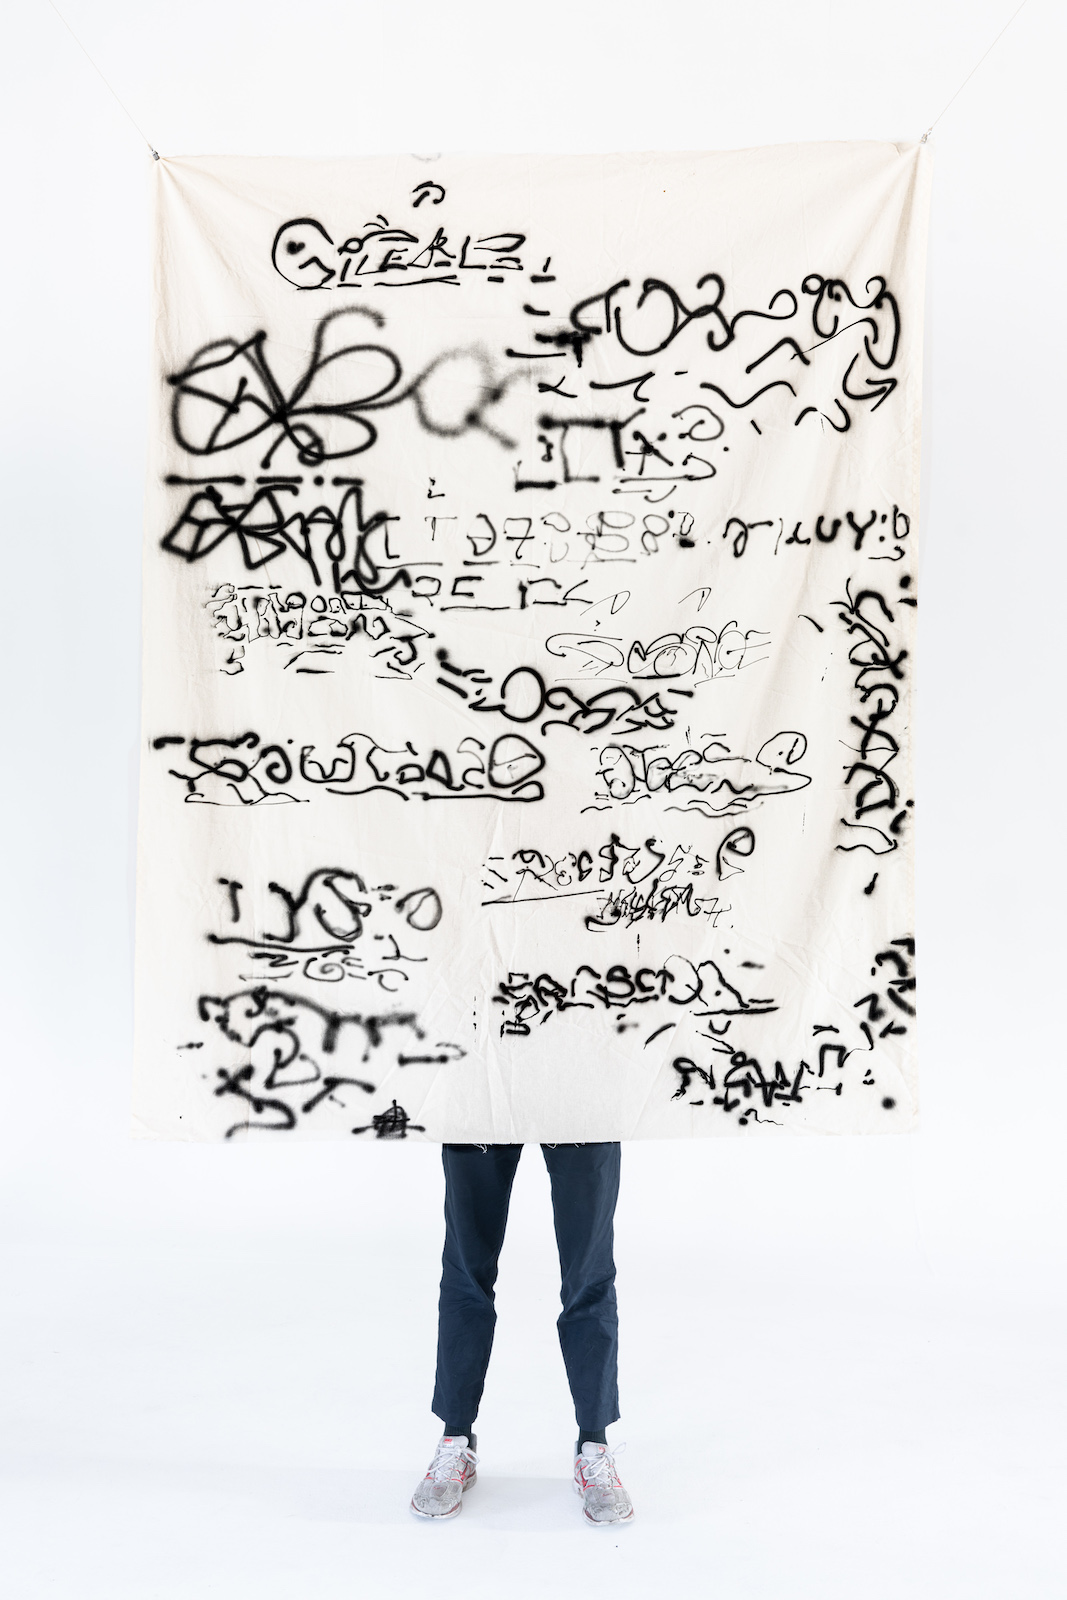 alsino skowronnek The Amazing Augmented Tagger Machine – Machine Learning & Graffiti